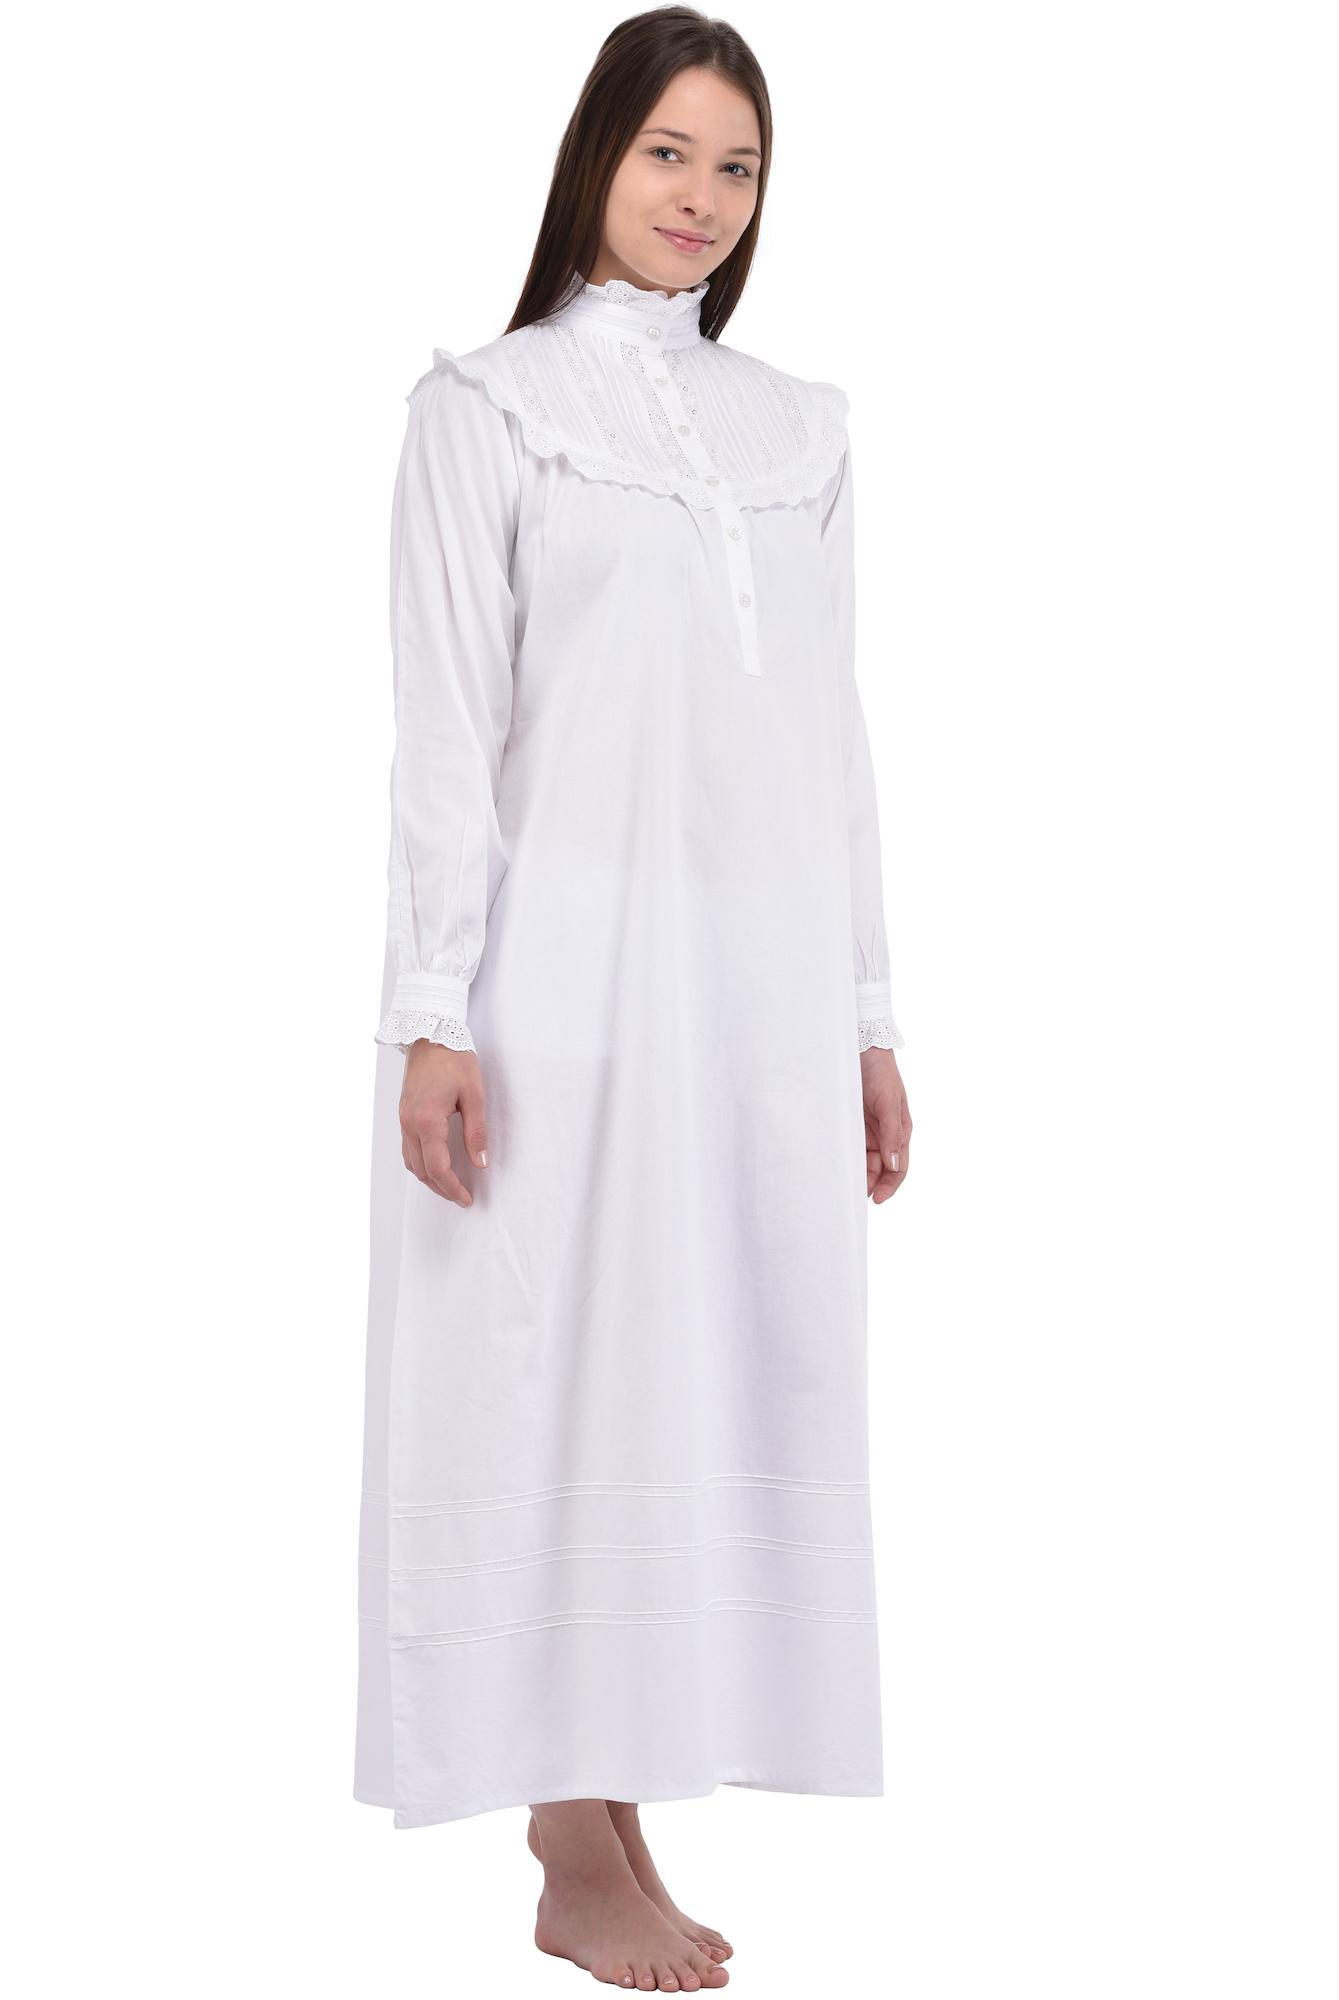 Old Fashioned White Cotton Night Dress | Cotton Lane | COTTON LANE